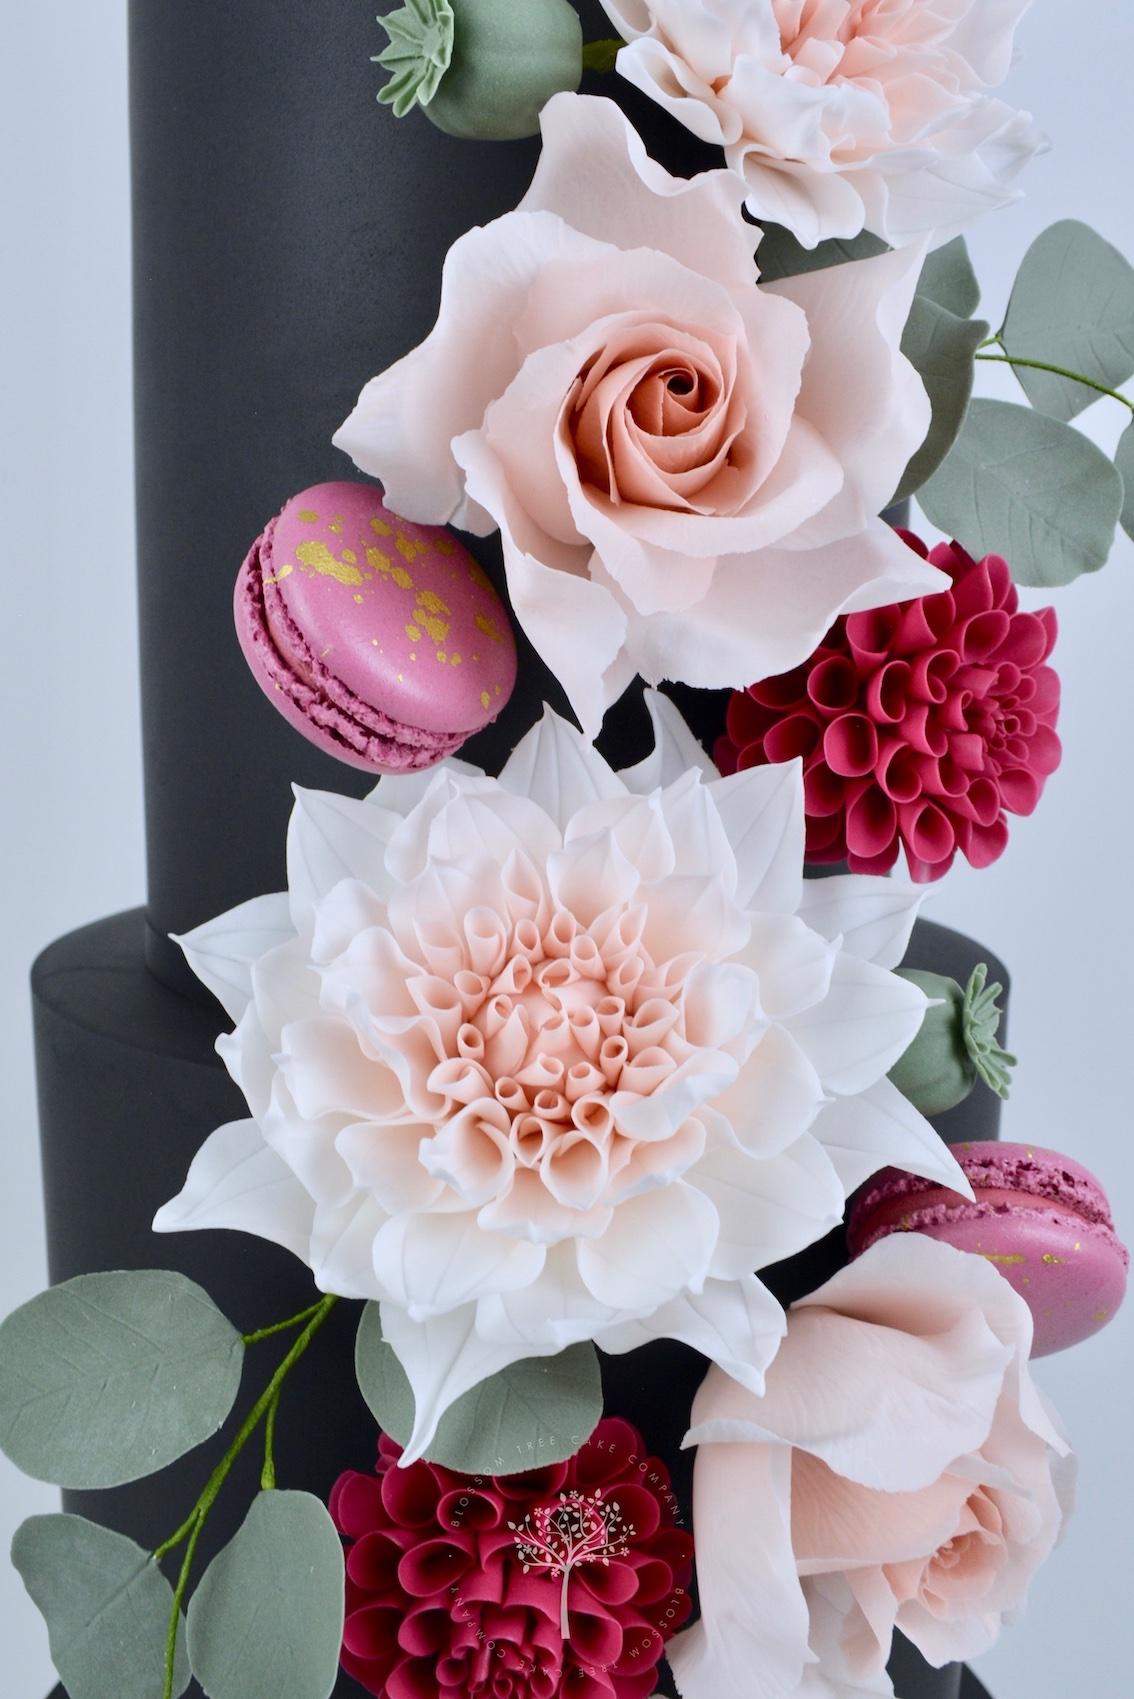 Dahlia & Black wedding cake by Blossom Tree Cake Company Harrogate North Yorkshire - sugar dahlias.jpg